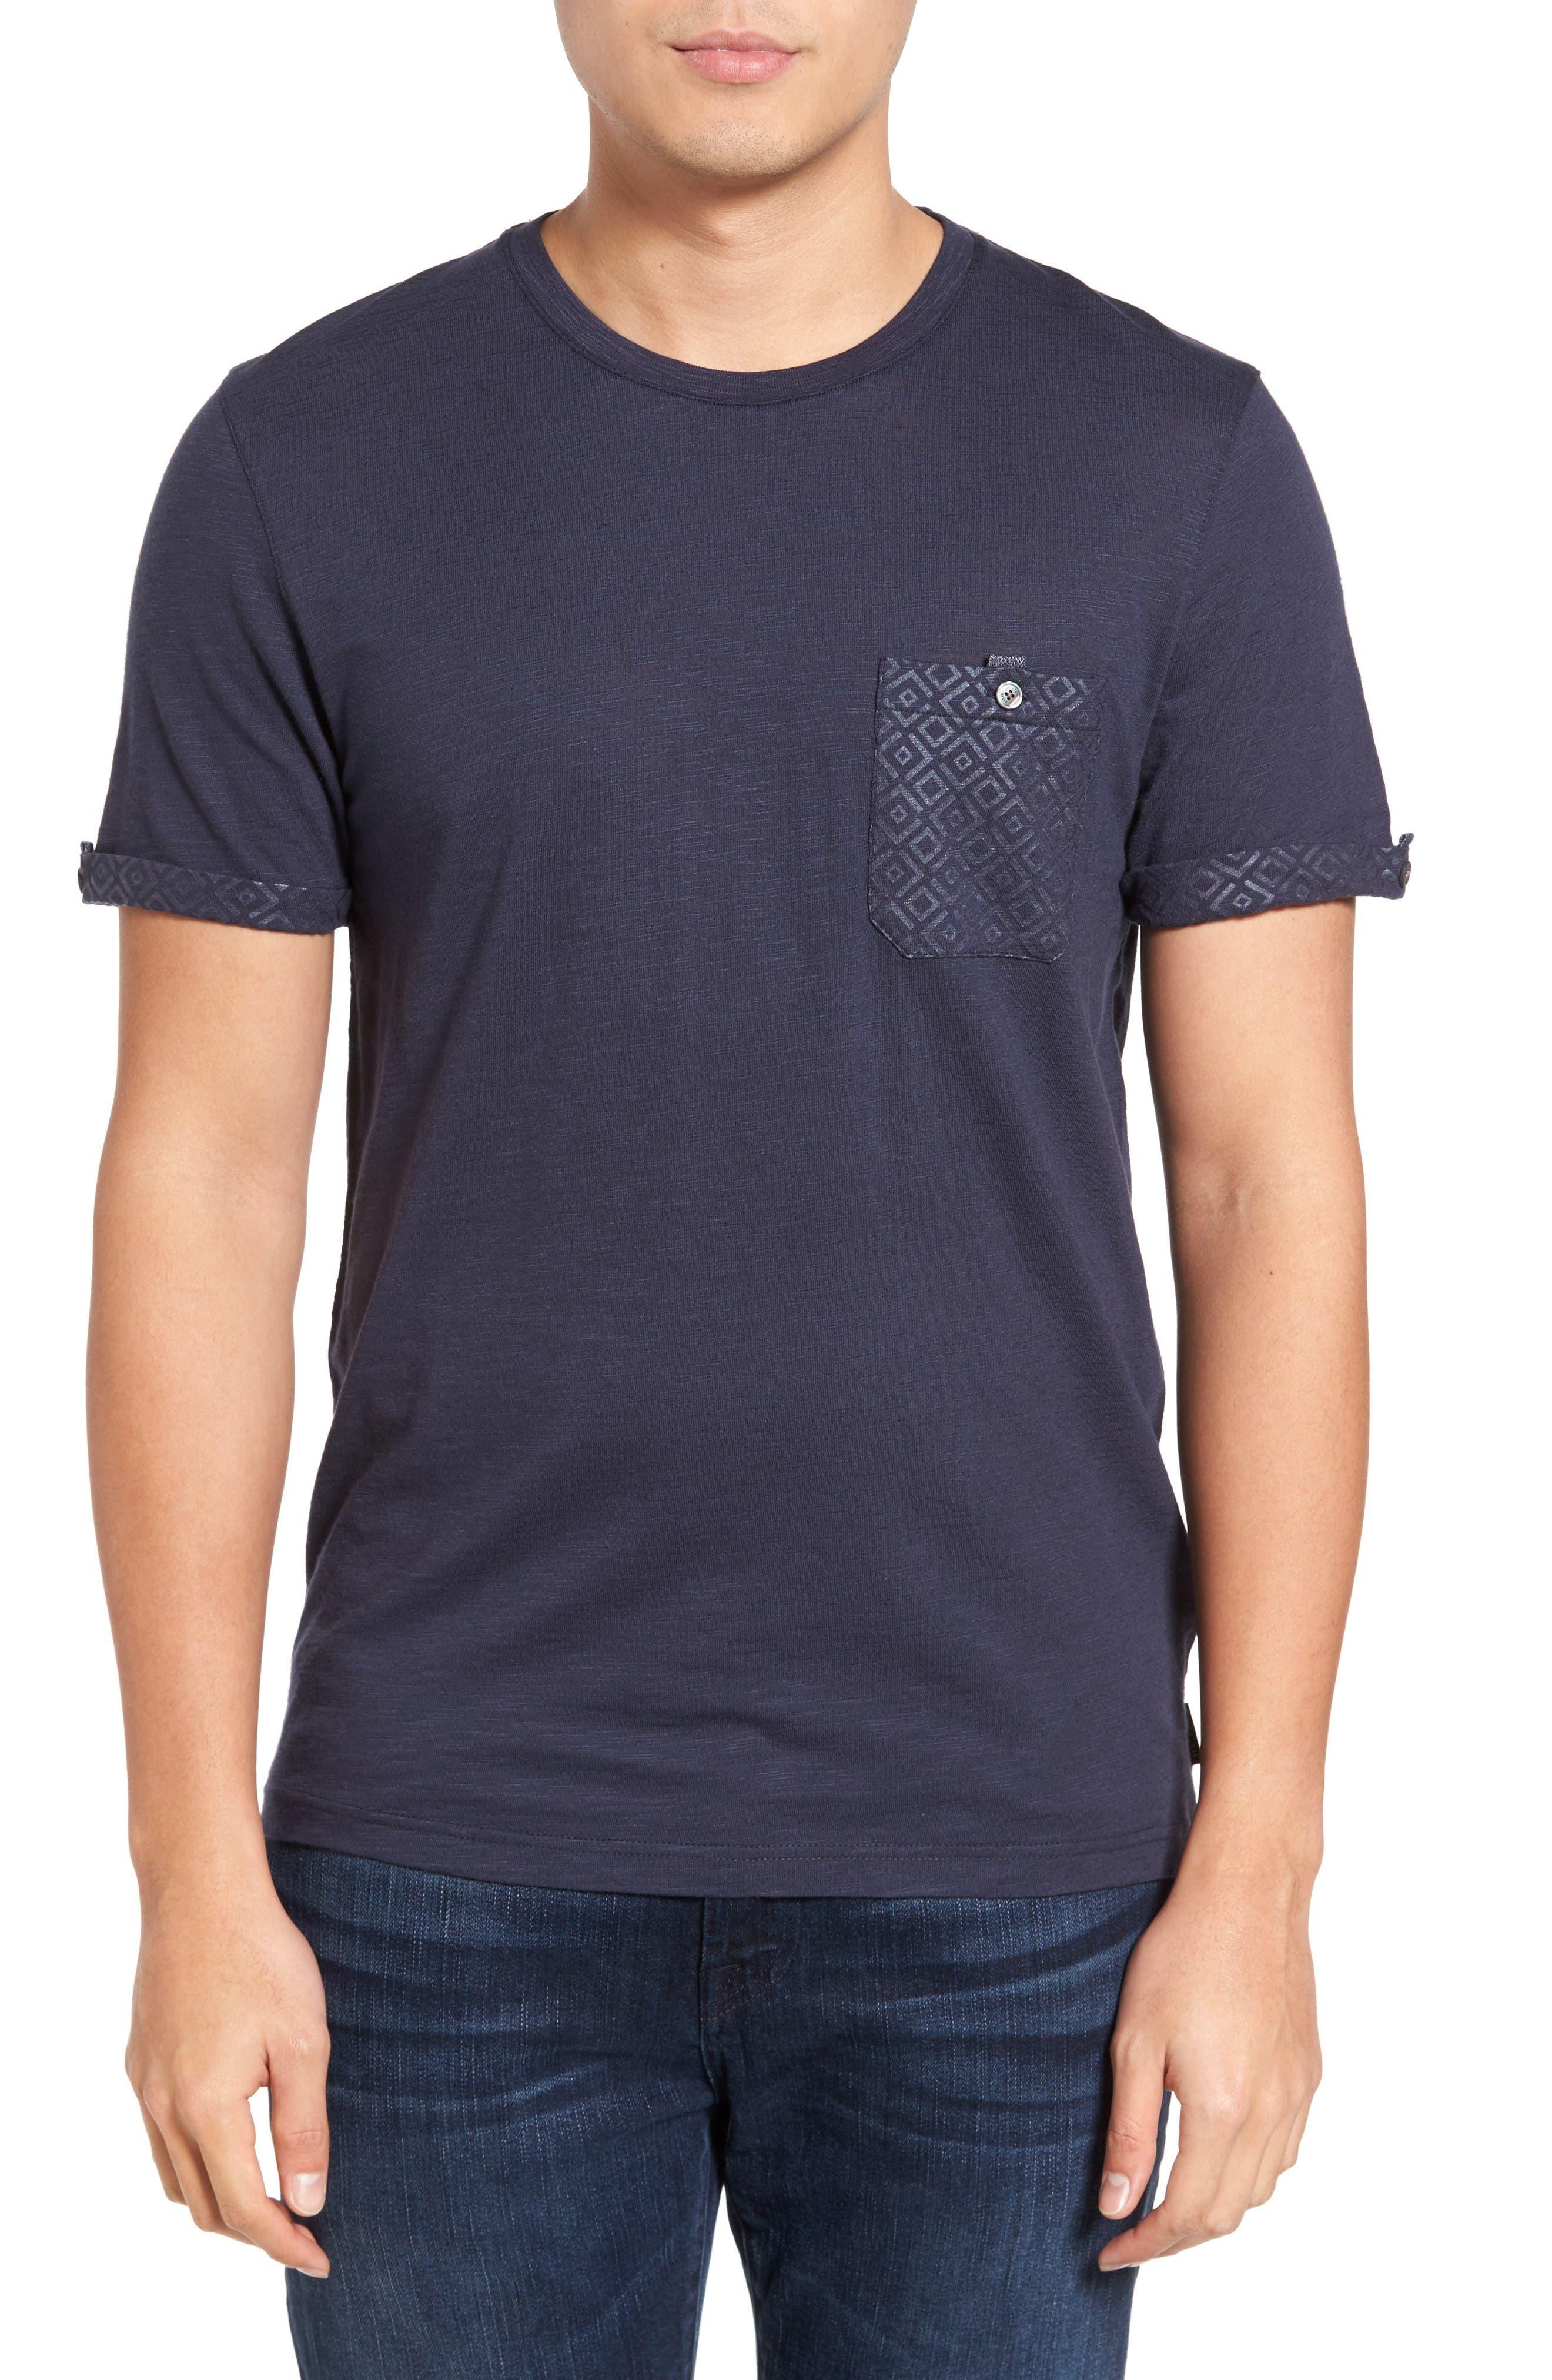 Alternate Image 1 Selected - Ted Baker London Apel Print Pocket T-Shirt